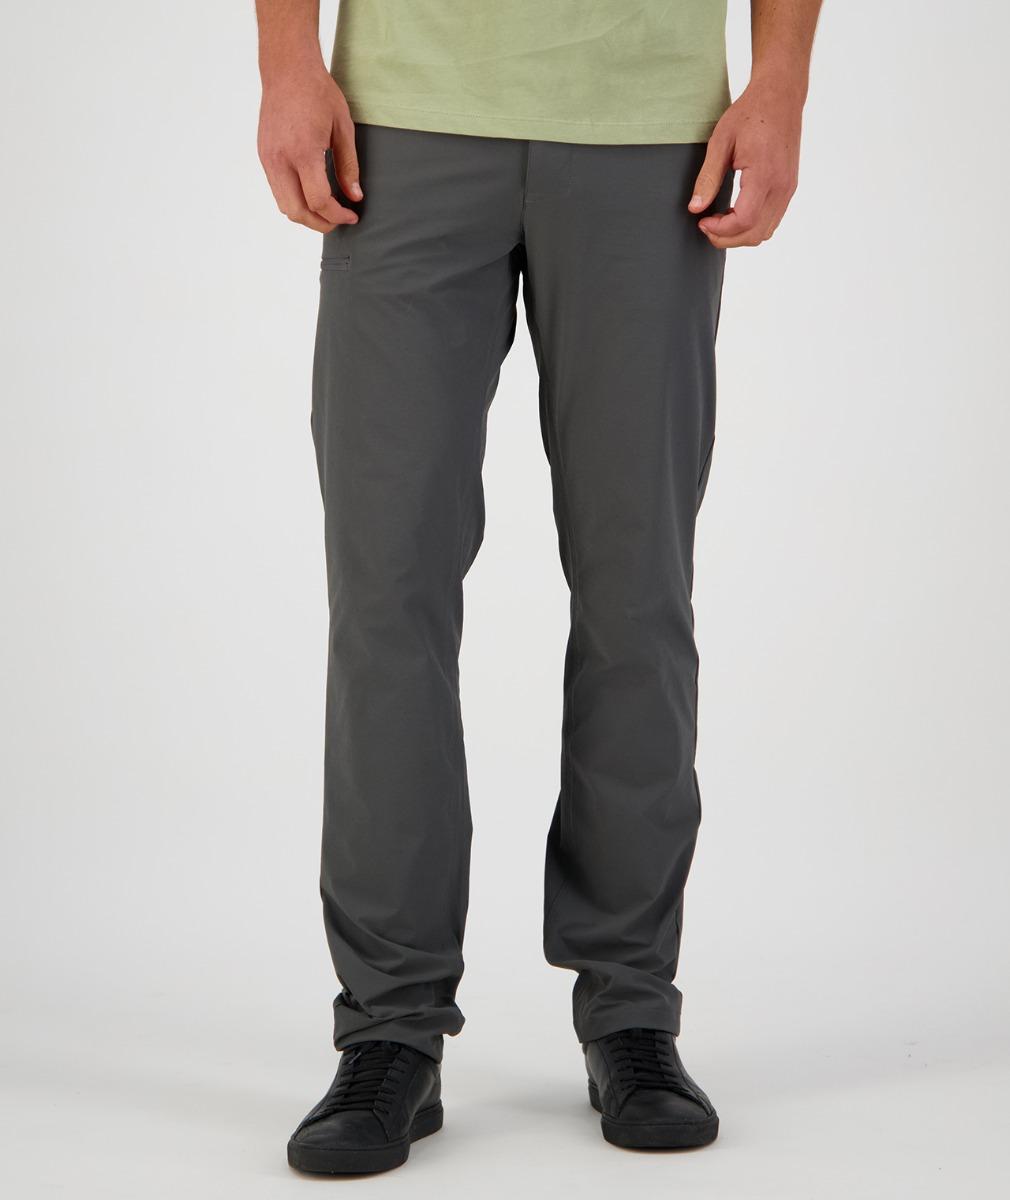 Swanndri Men's Point Wells V2 Travel Pants in Dark Grey